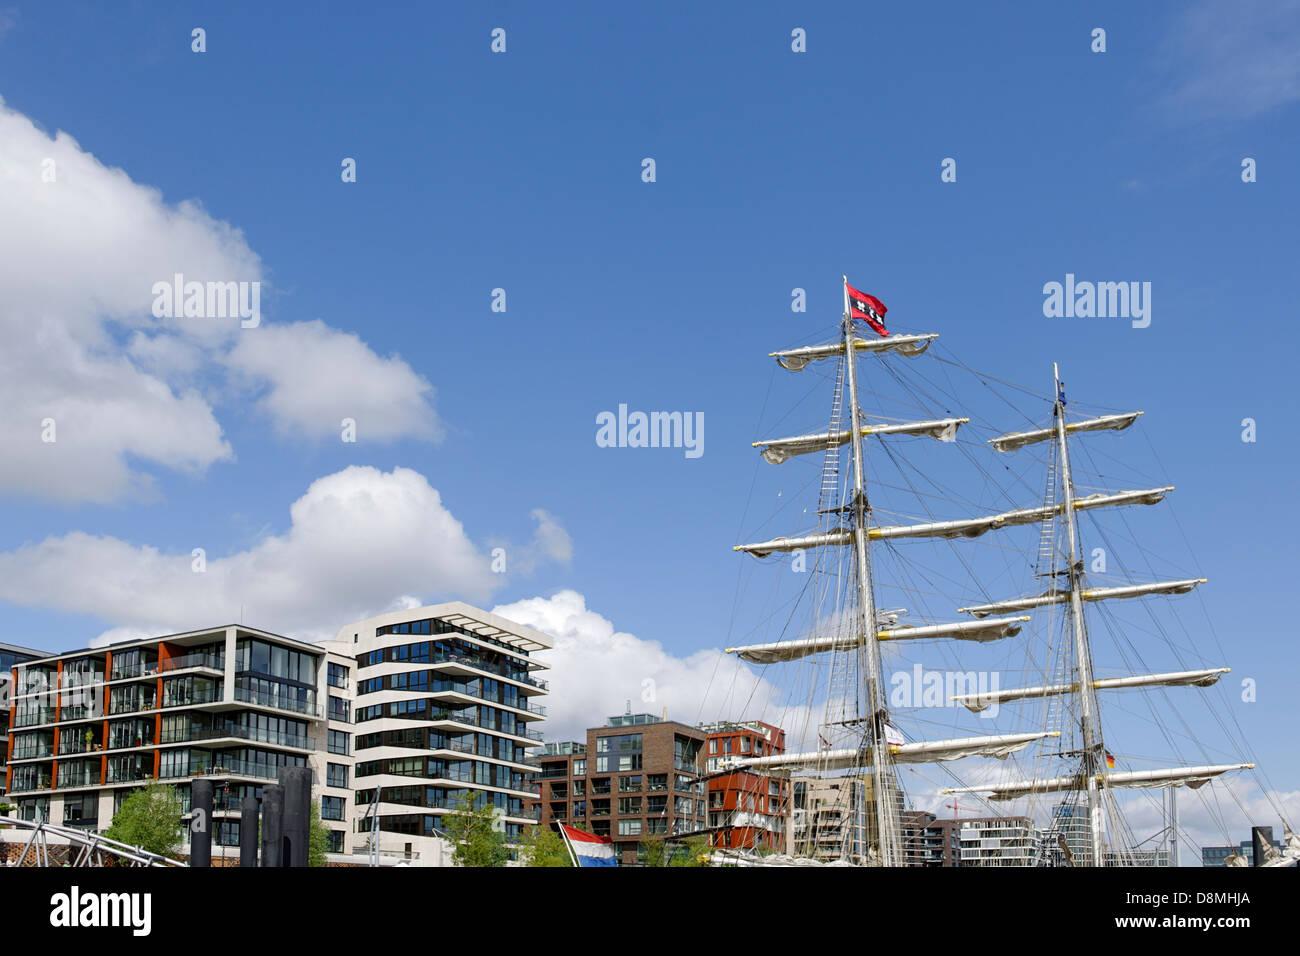 Sailing ships in the harbor, Hamburg, Germany - Stock Image